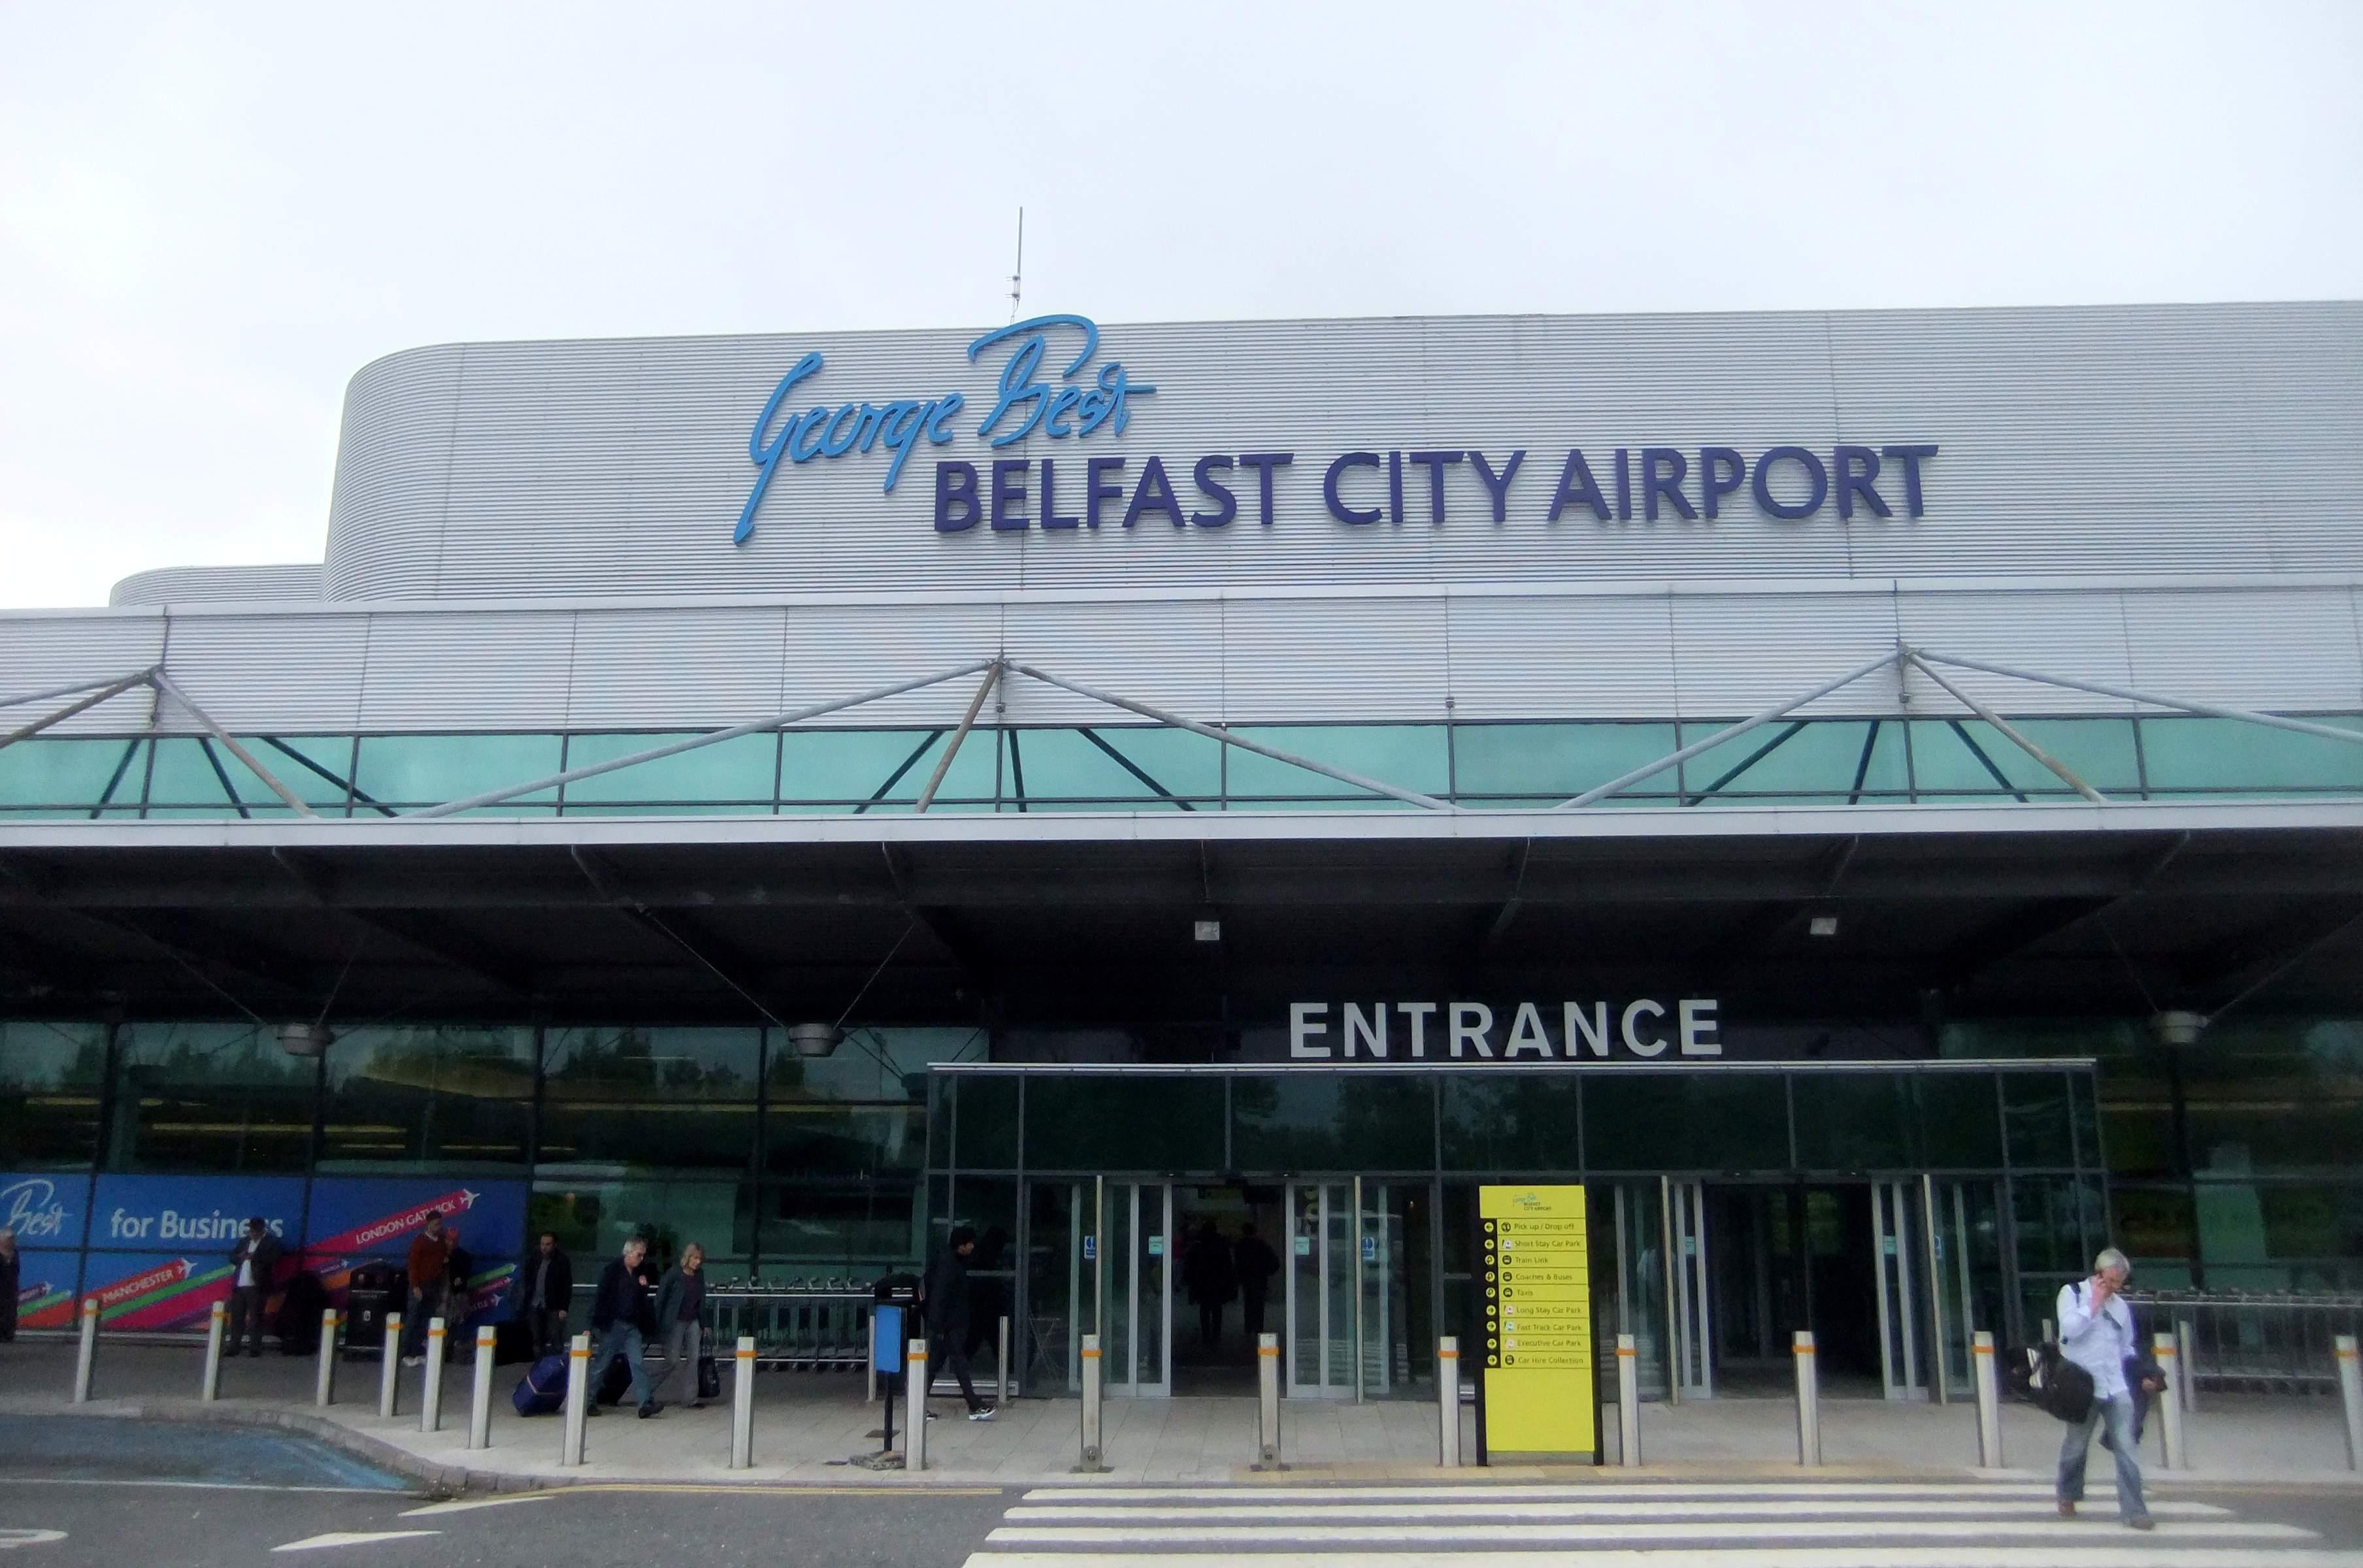 George Best airport